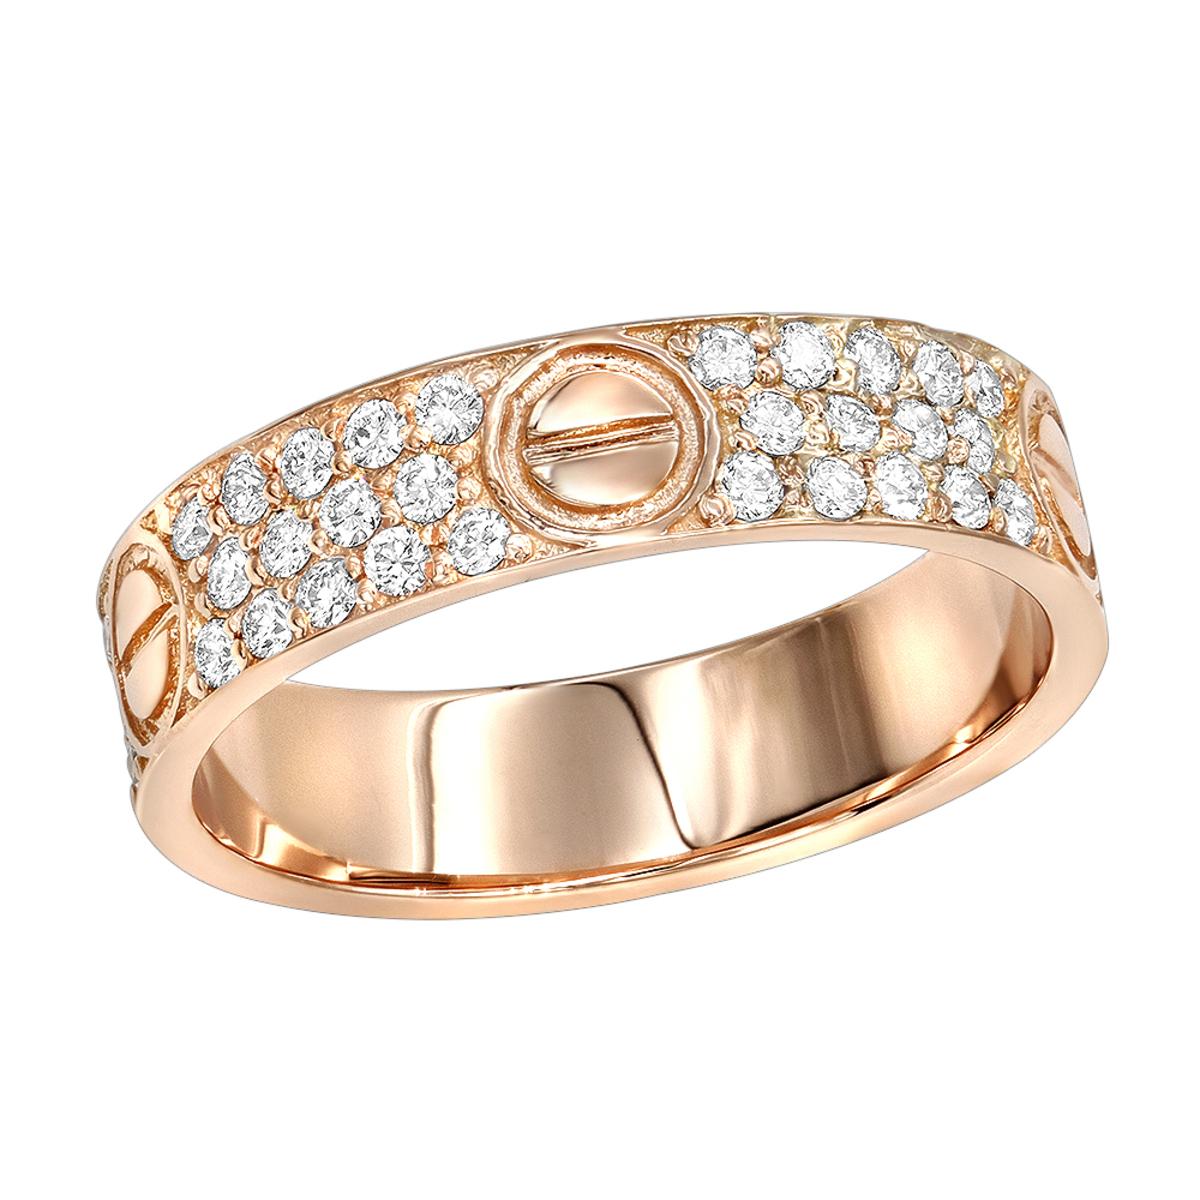 18k gold unique cartier style diamond wedding band for women 1 carat 18k gold unique cartier style diamond wedding band for women 1 carat gvs junglespirit Gallery